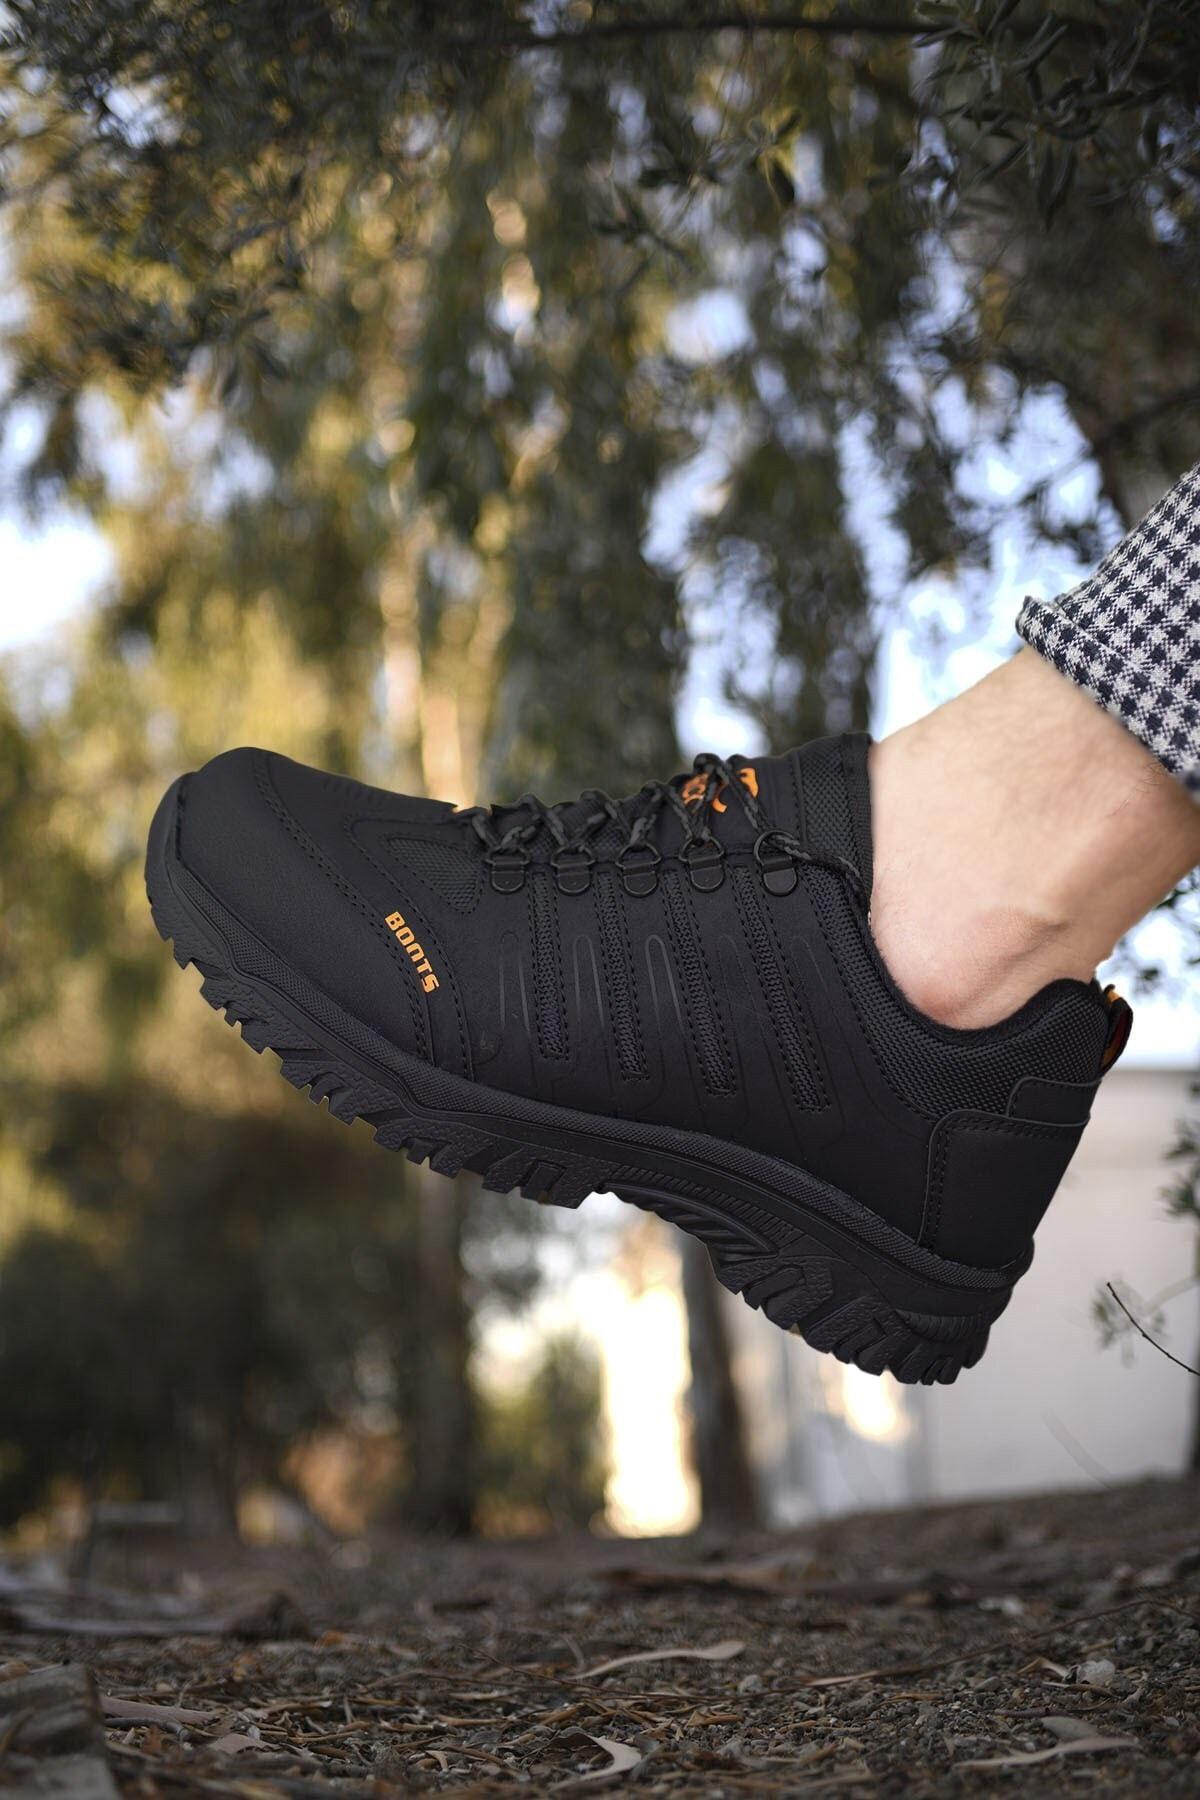 Riccon Siyah Siyah Erkek Trekking Ayakkabı 0012115 1